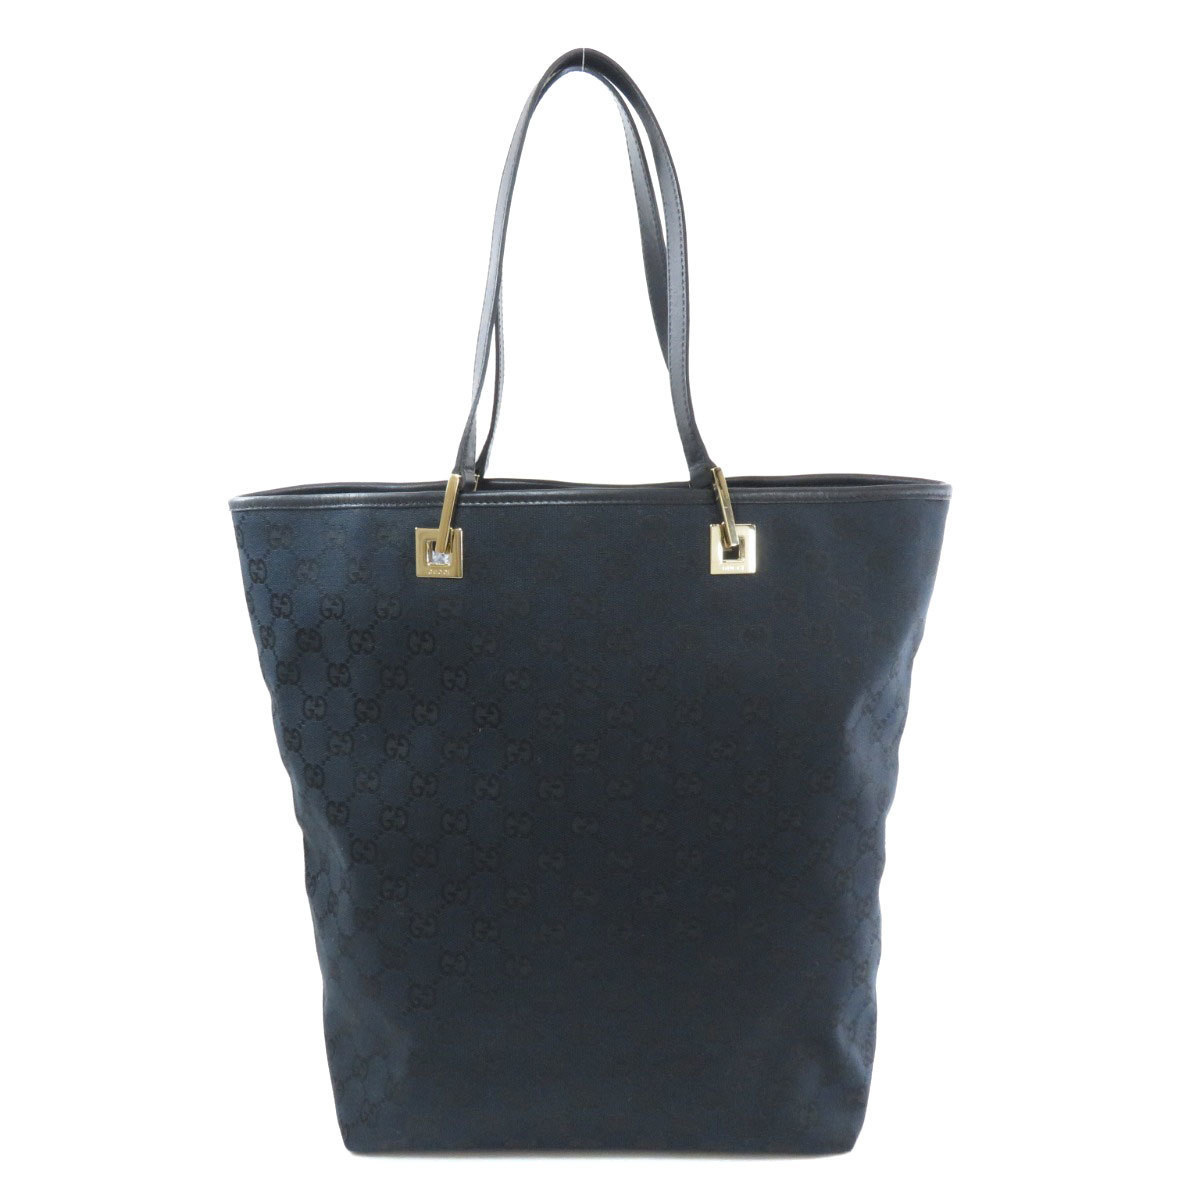 Gucci 002/1098 GG Tote Bag Canvas Ladies